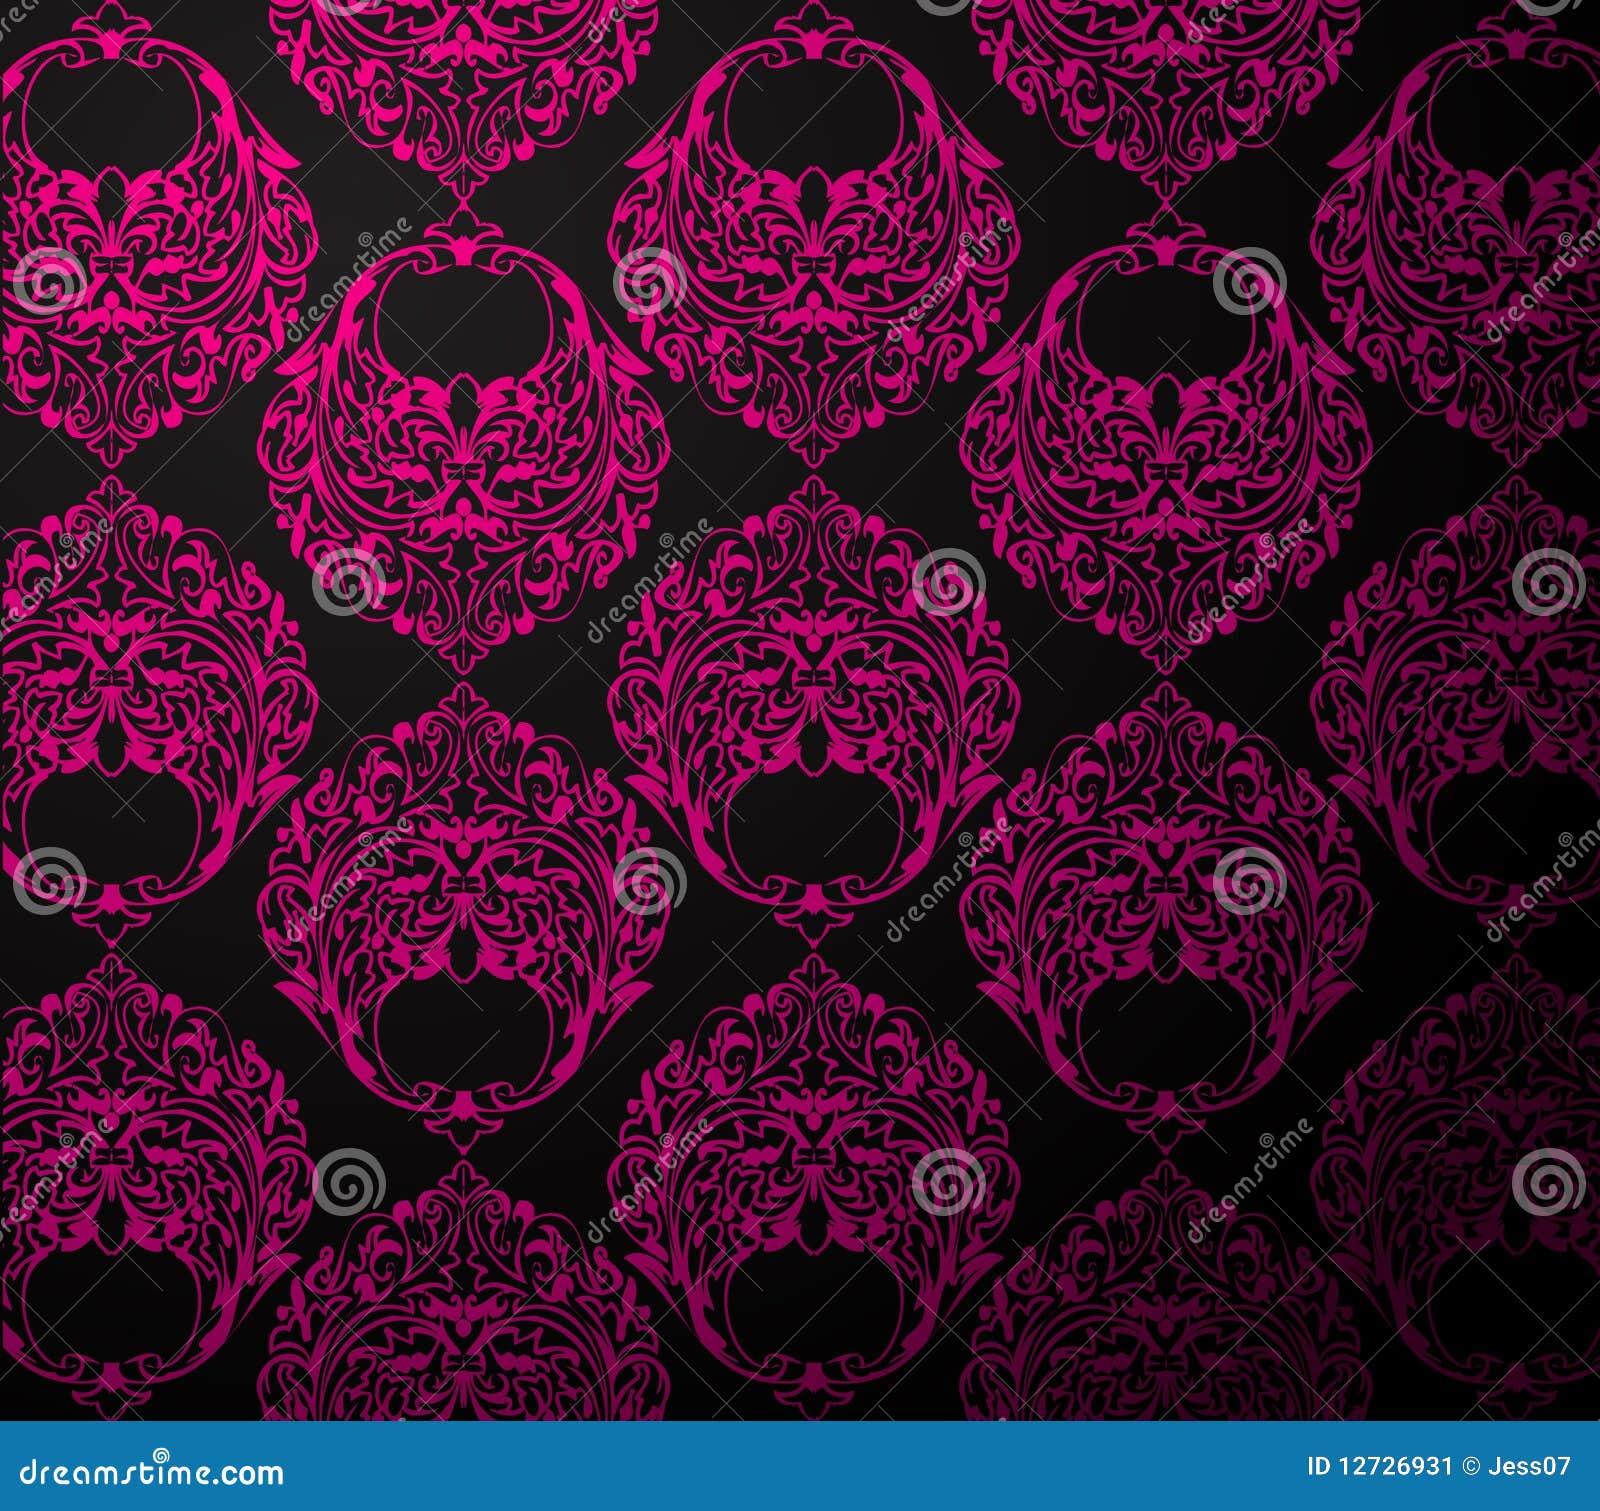 Wallpaper Black Pink: Black And Pink Wallpaper Stock Vector. Illustration Of